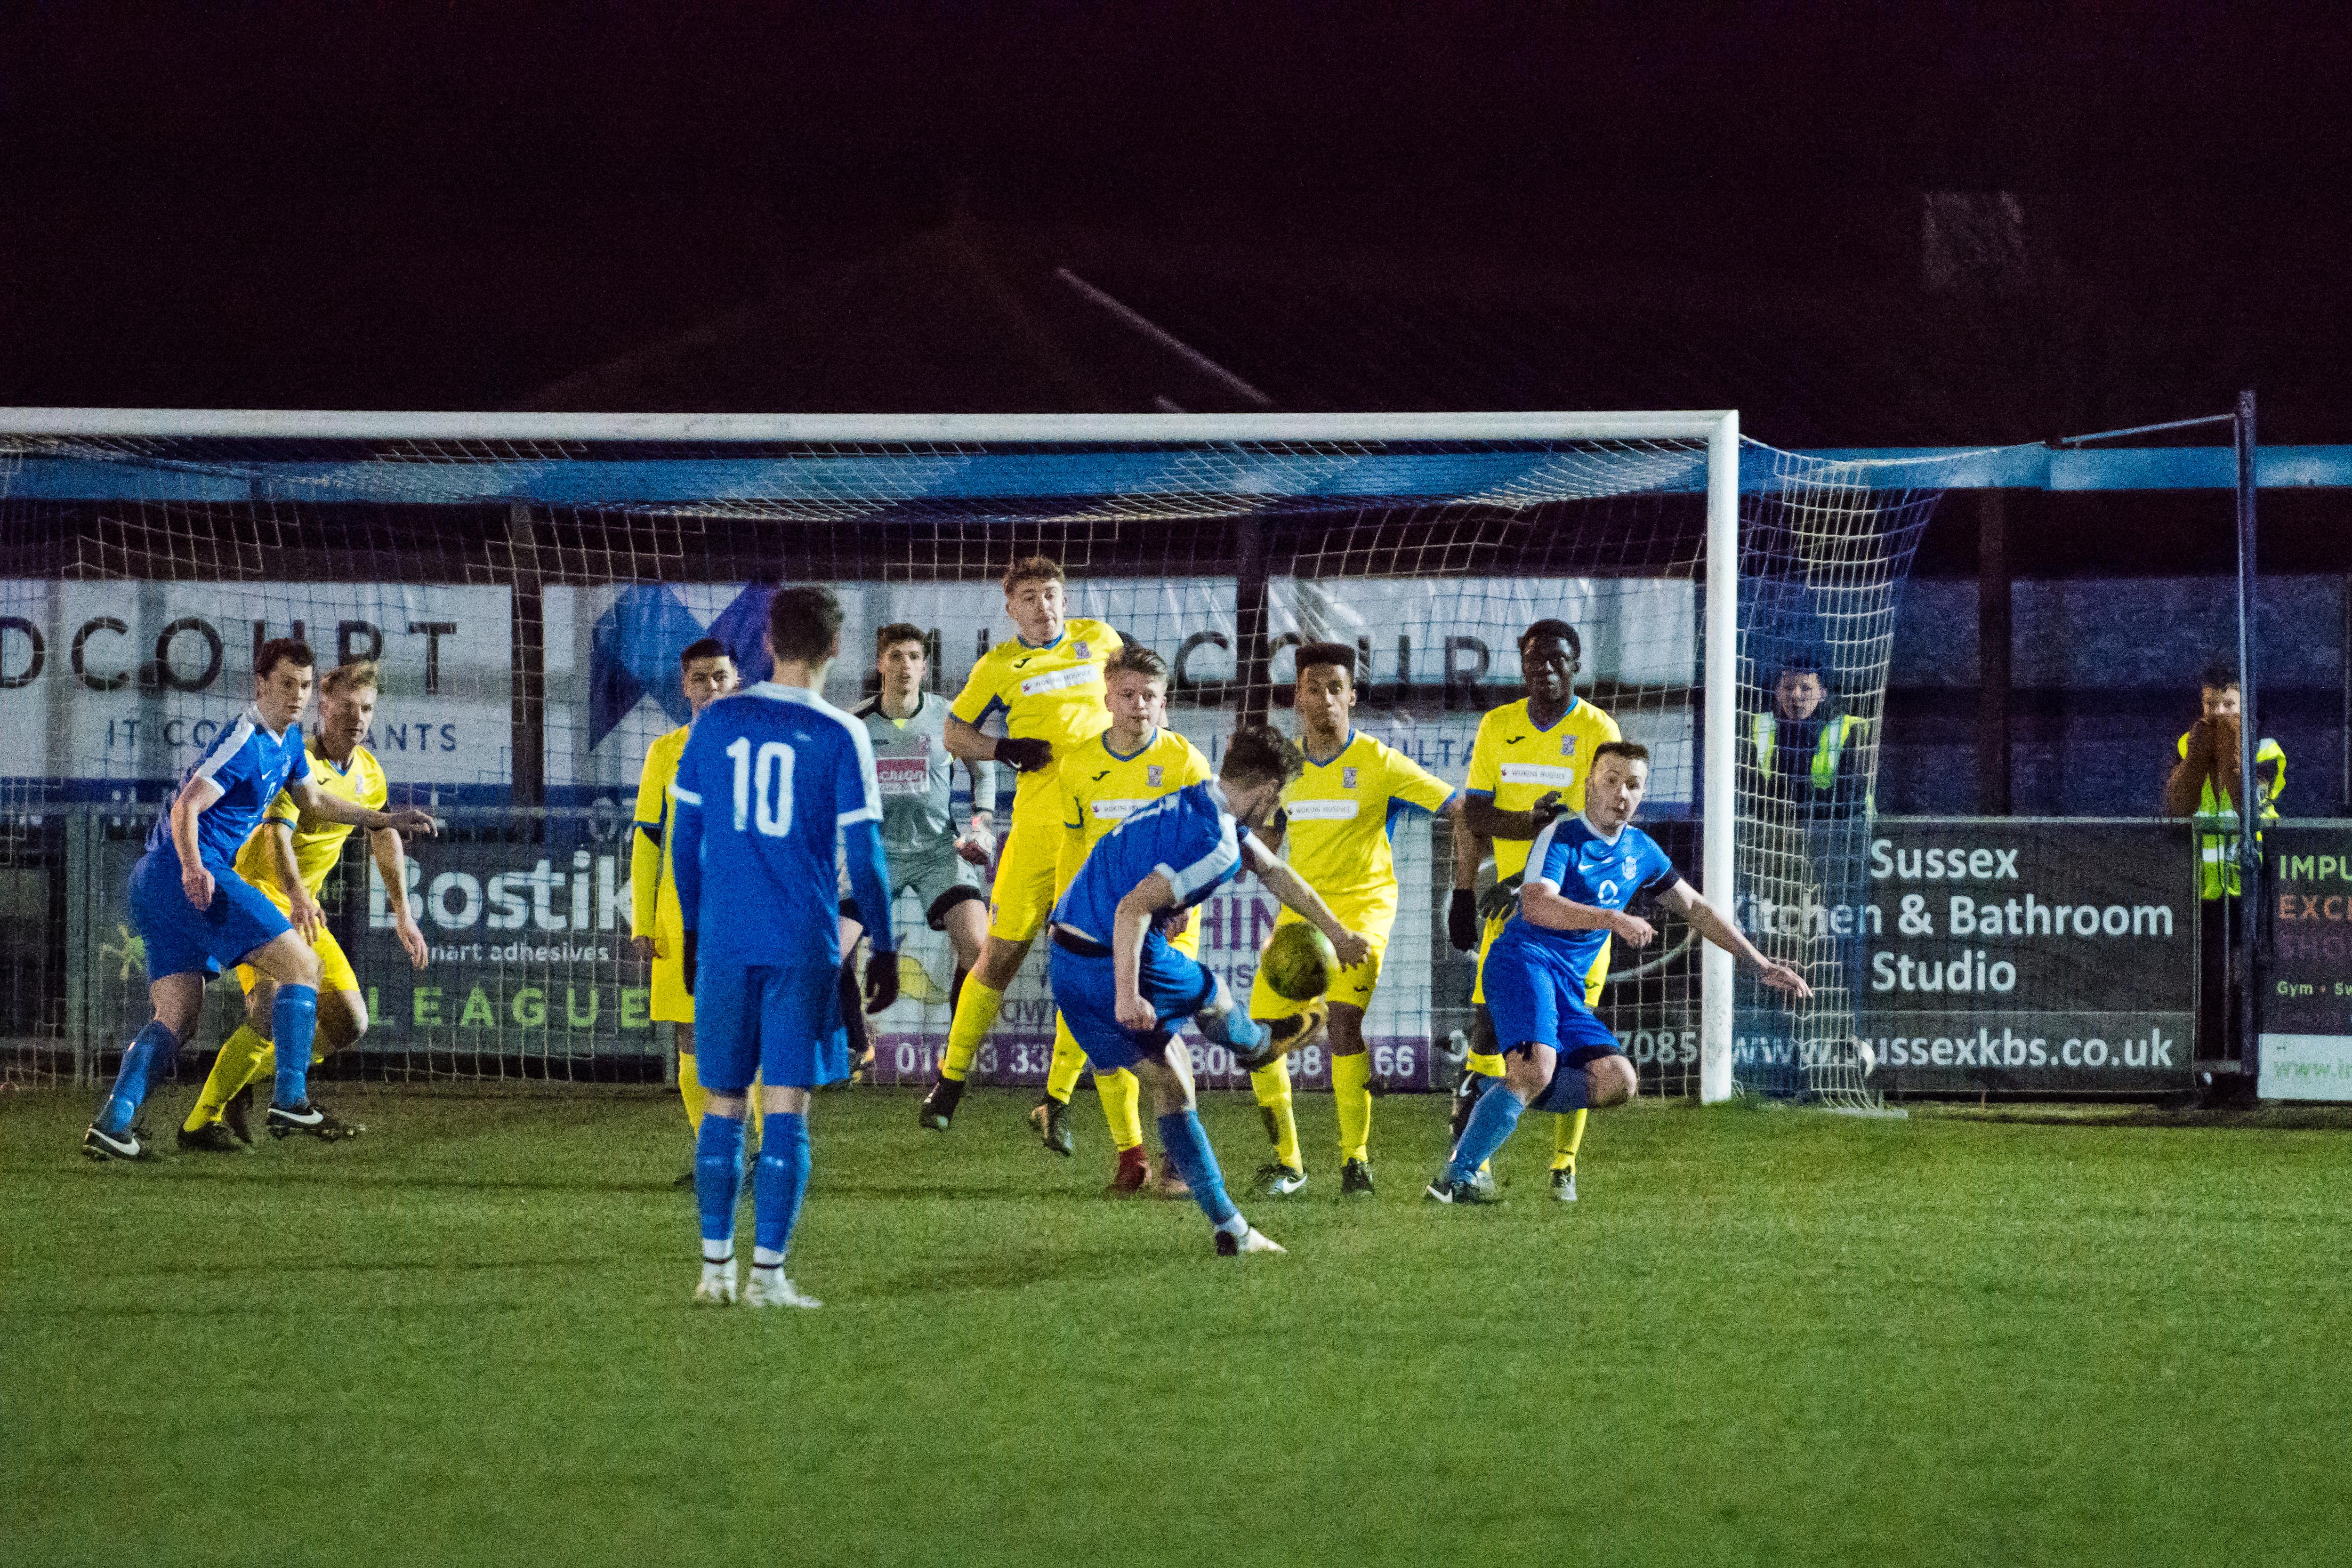 DAVID_JEFFERY Shoreham FC U18s vs Woking FC Academy 22.03.18 63